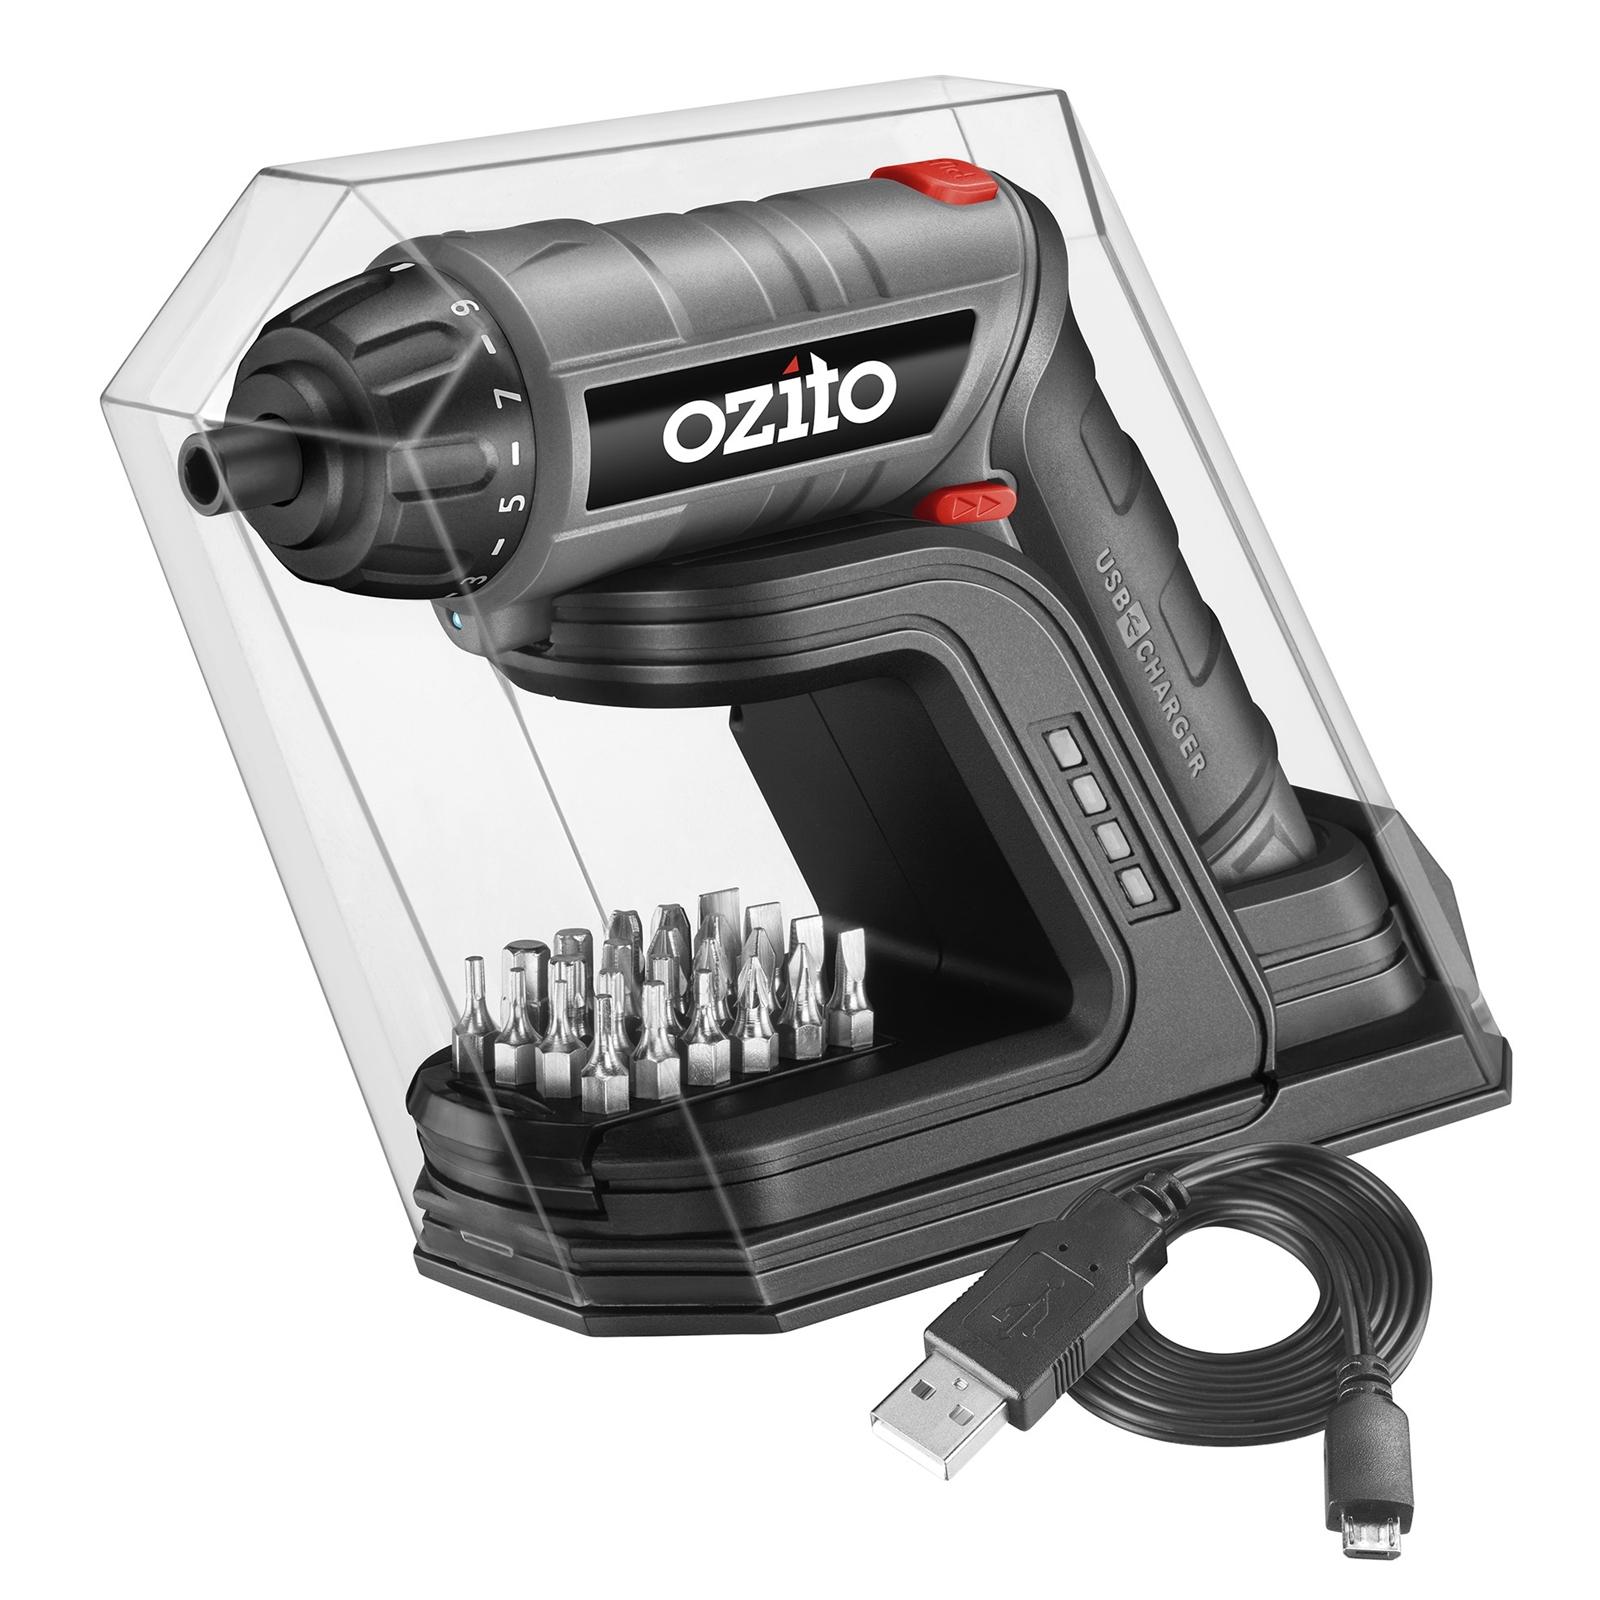 Ozito 3.6V Cordless Screwdriver With USB Changing Base